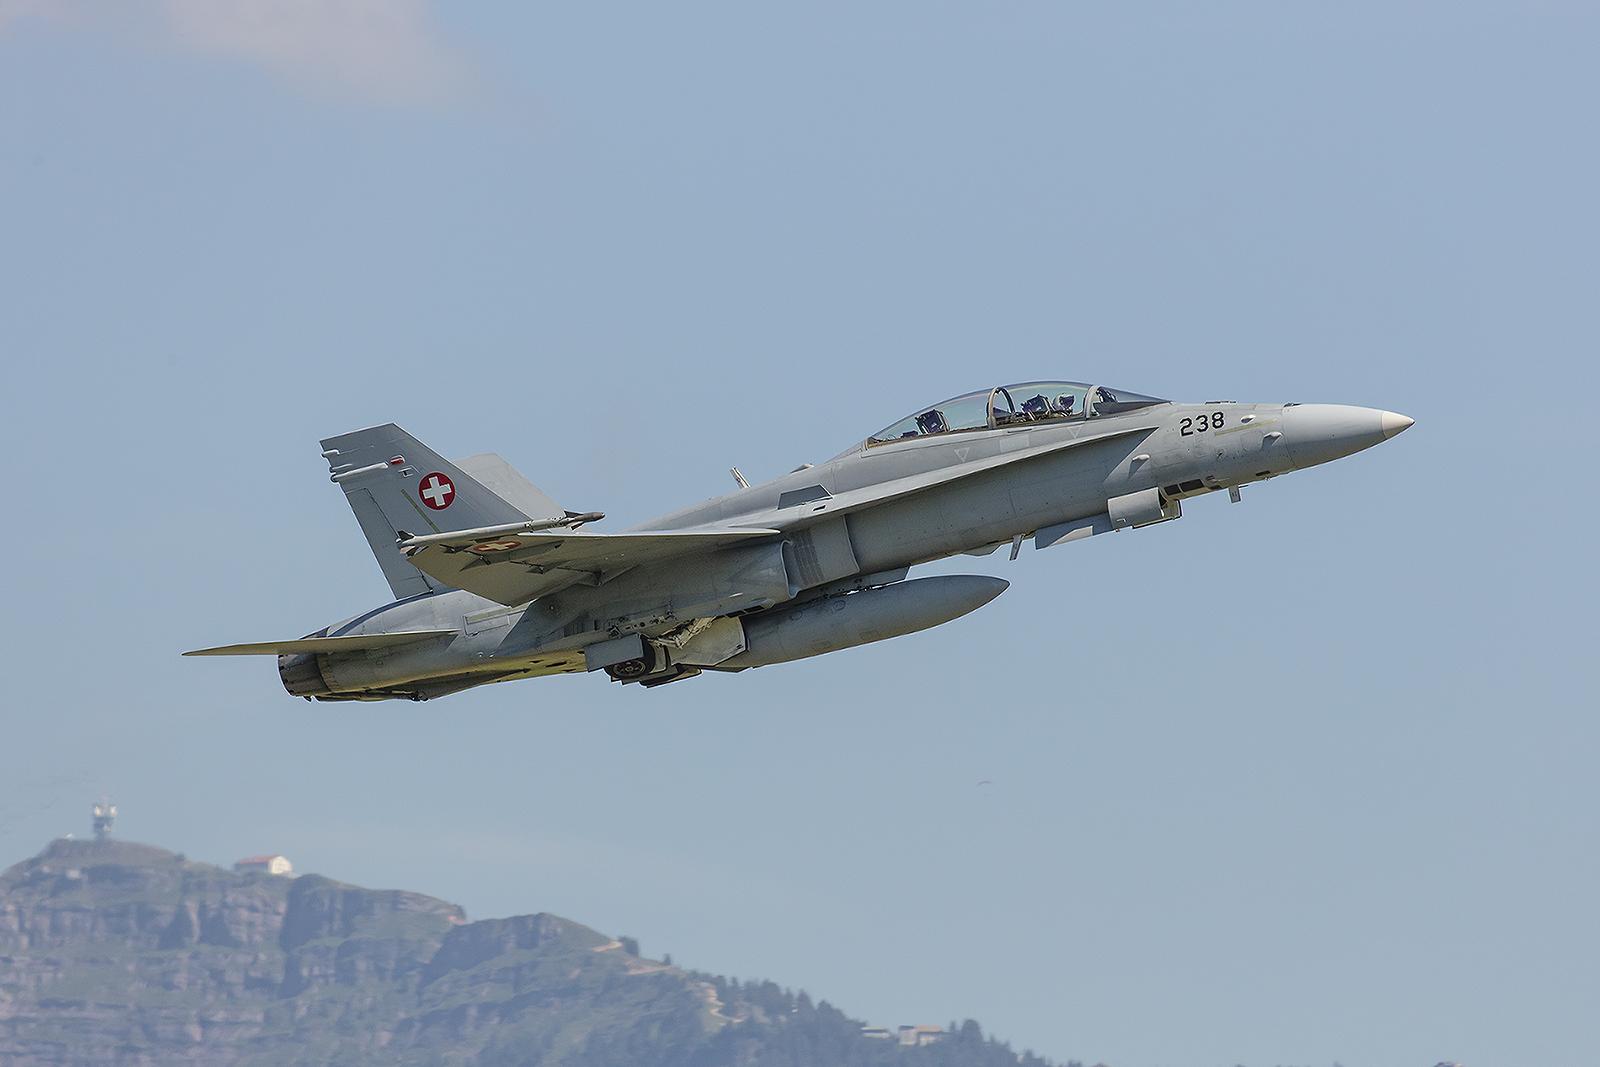 F-18 mit dem Gipfel des Rigi